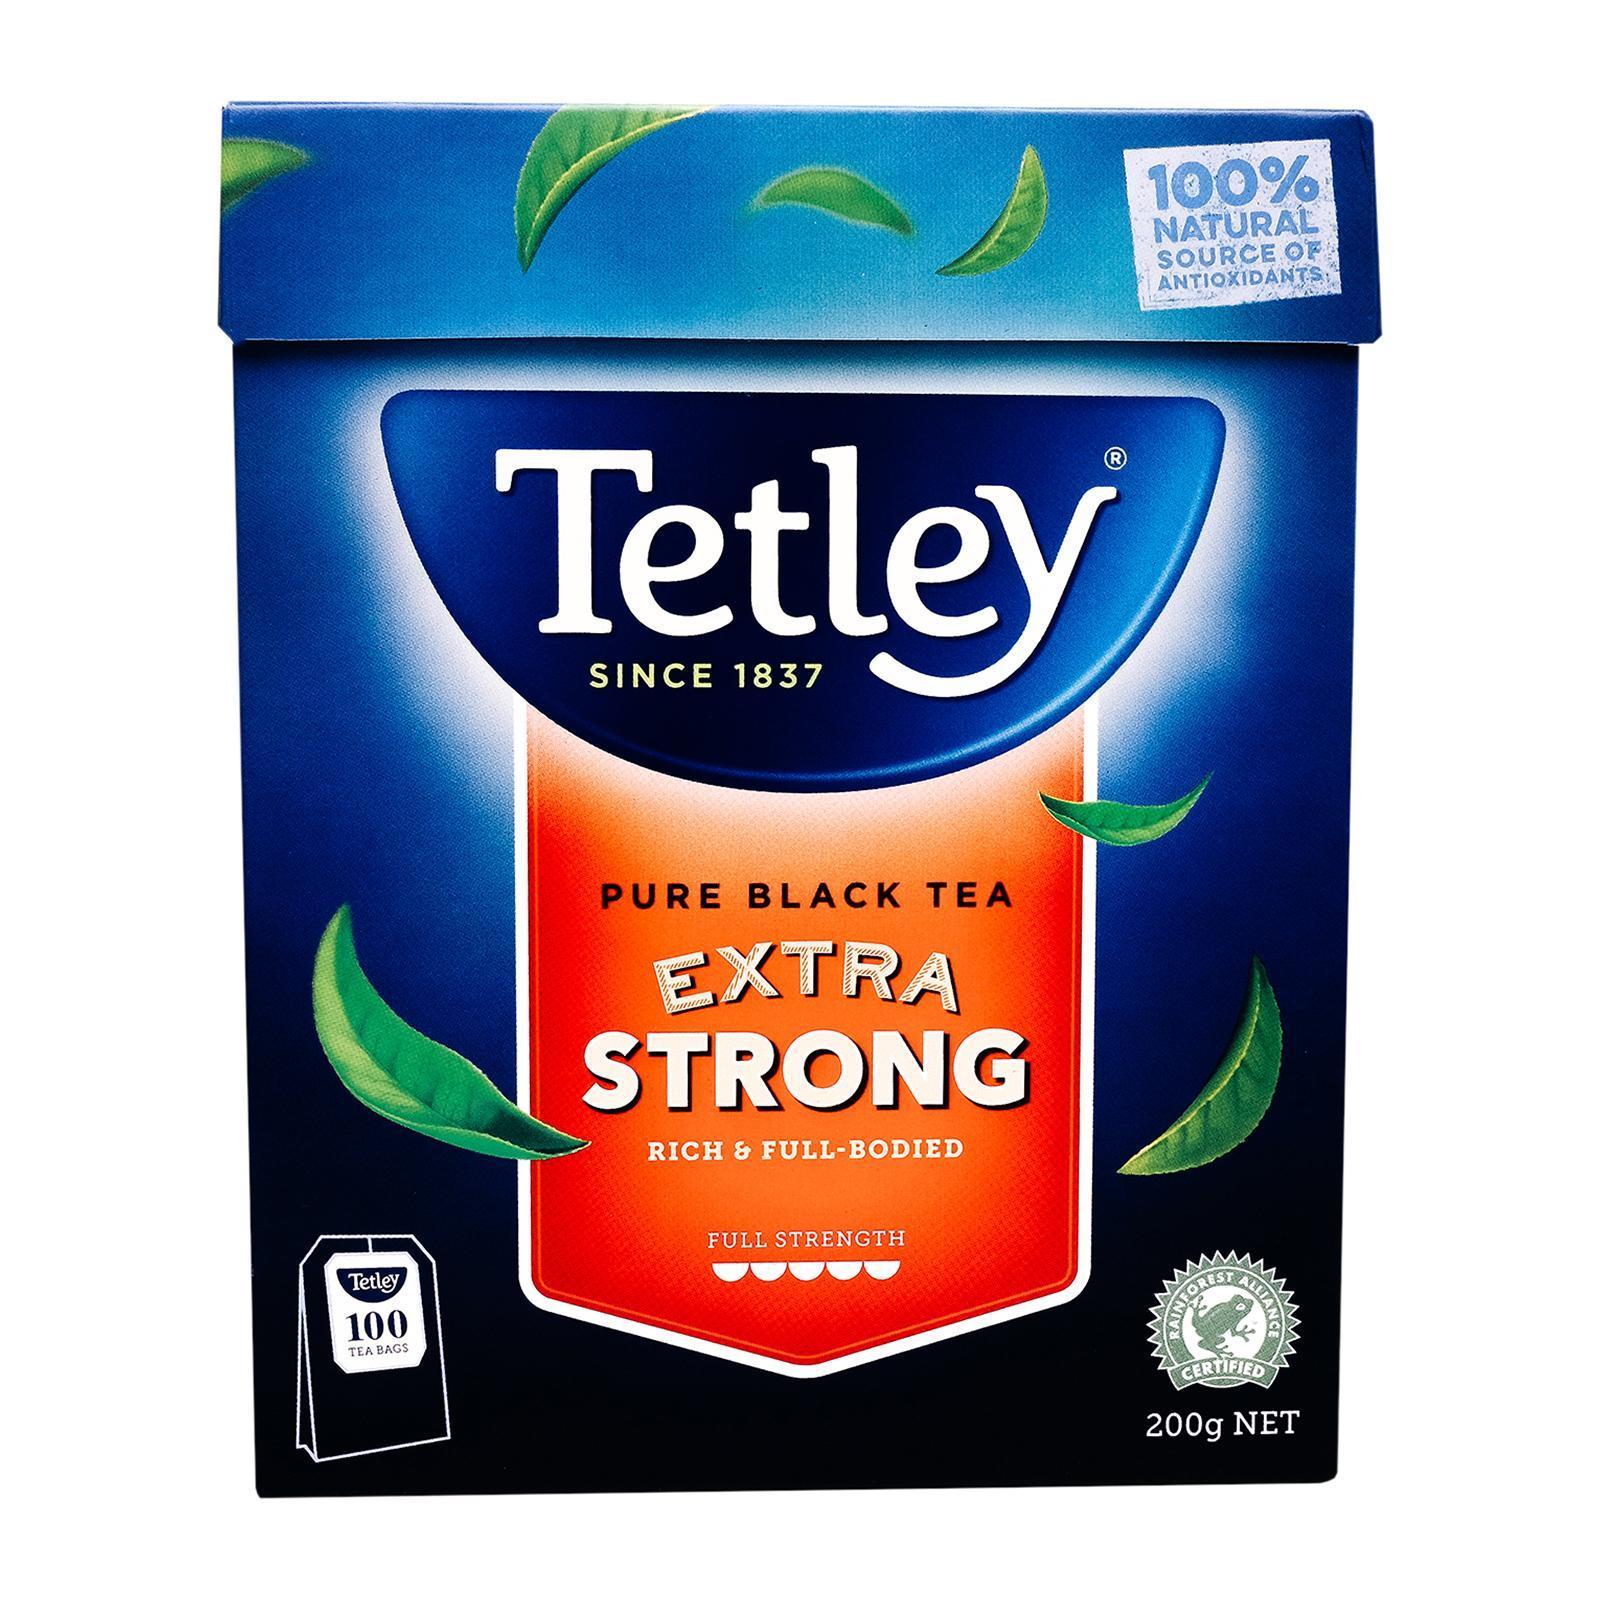 Tetley Australia Pure Black Tea Extra Strong - By Sonnamera - By Sonnamera